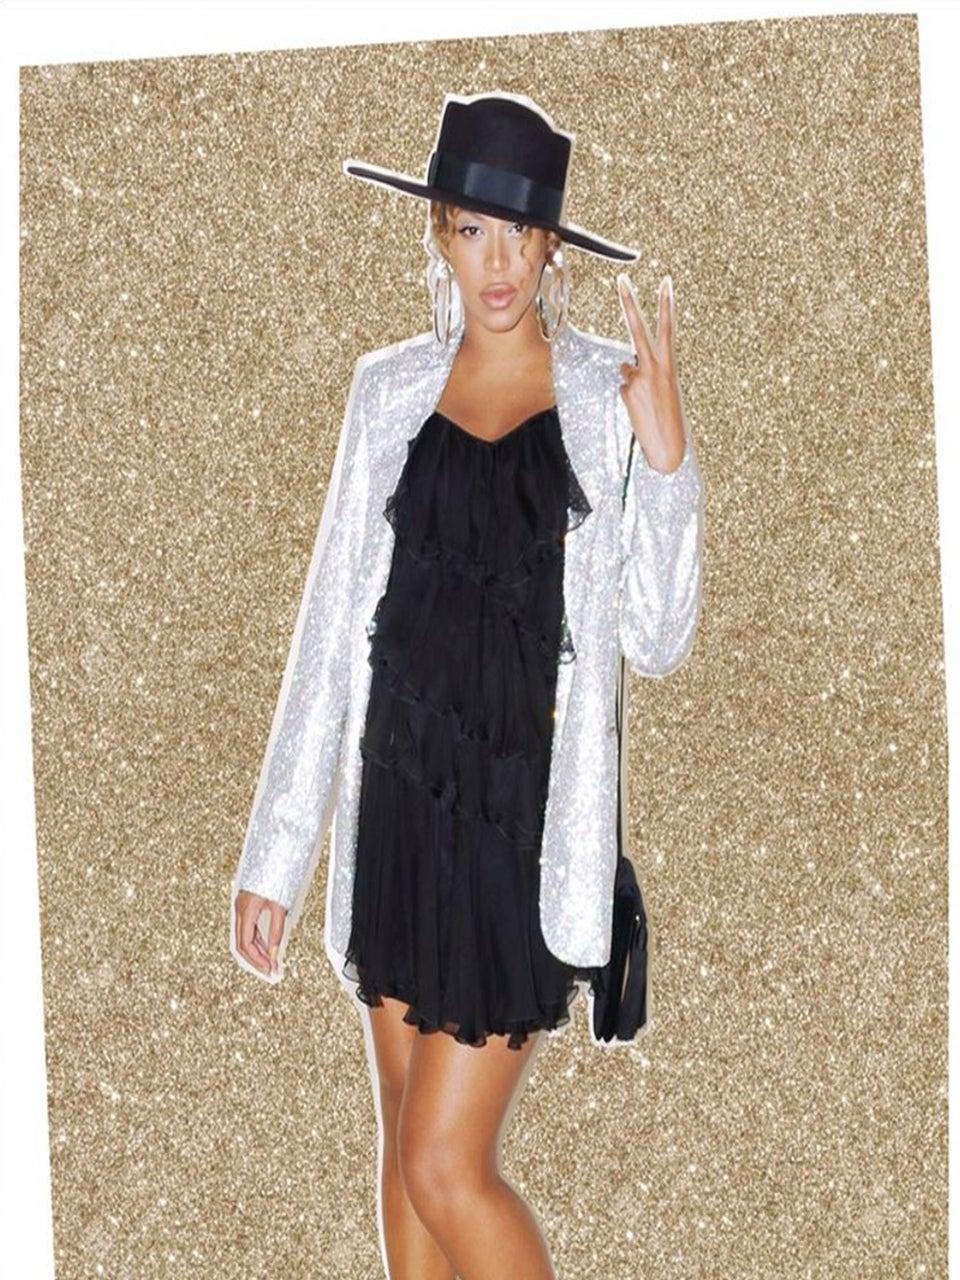 Pregnant Beyoncé Channels Michael Jackson in $4,950 Rhinestone Jacket at Jessica Alba's Birthday Party